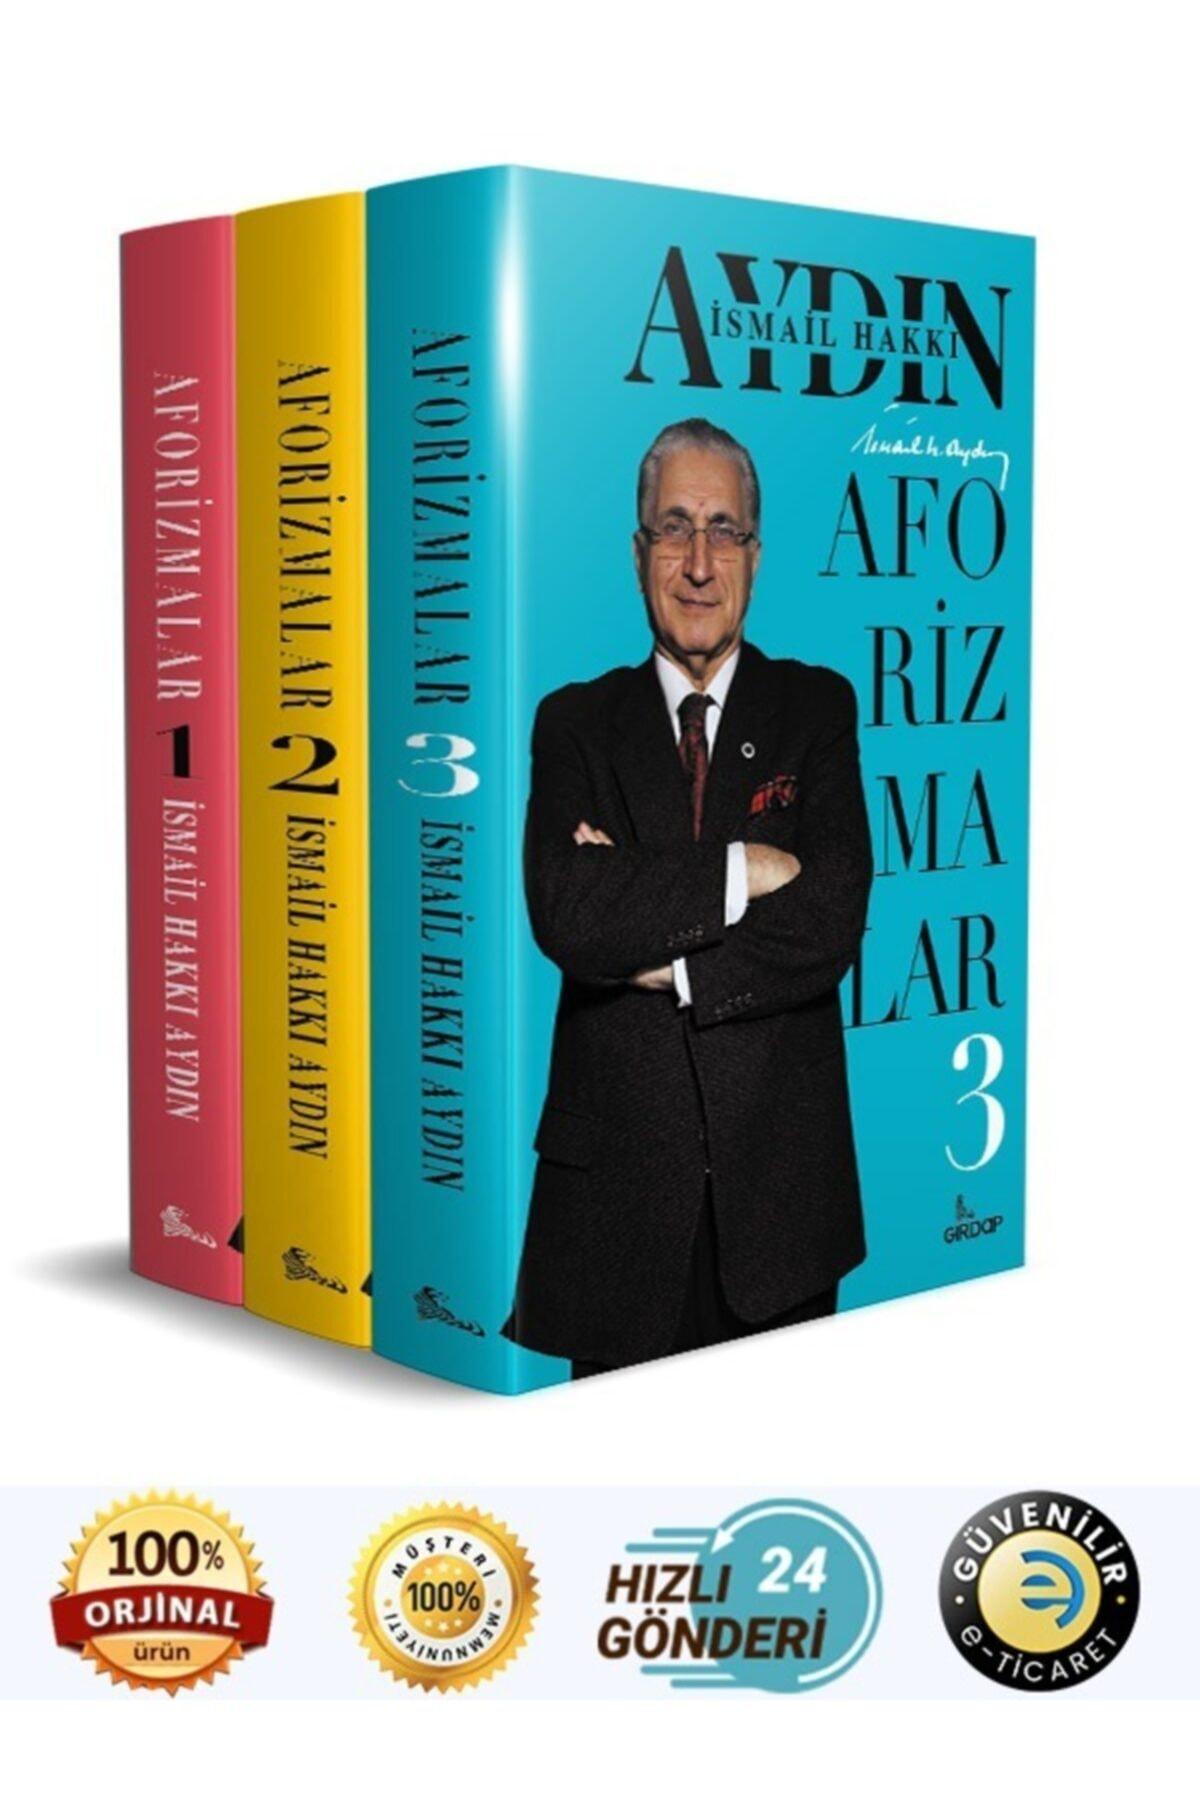 Girdap Kitap Prof.dr.ismail Hakkı Aydın - Aforizmalar 1 , Aforizmalar 2 , Aforizmalar 3 ( 3 Kitap Set ) 1